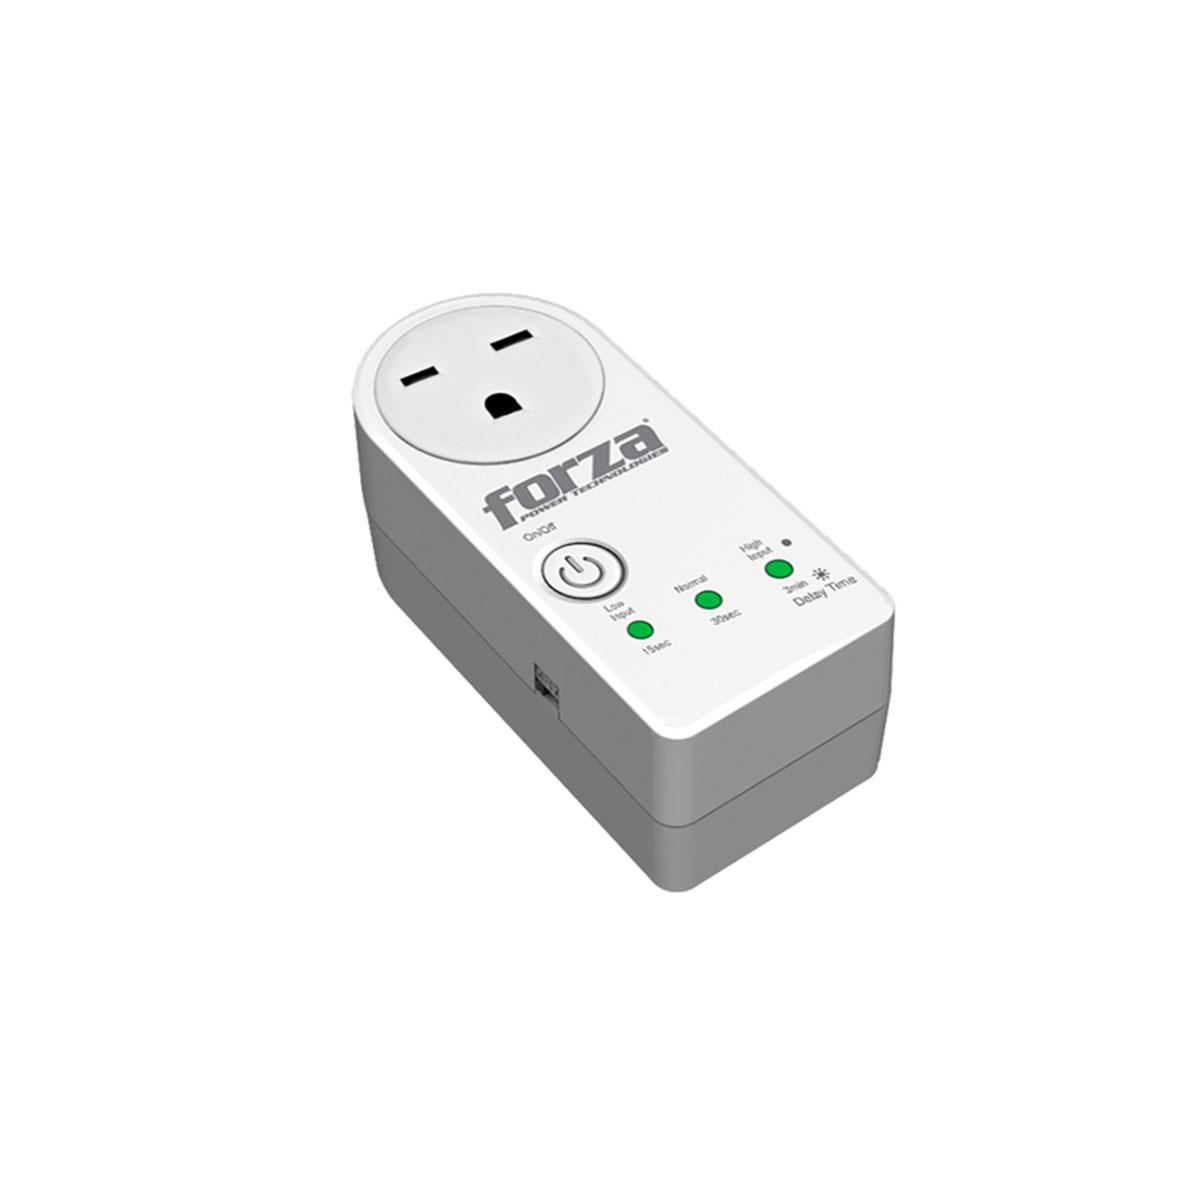 Protector de Voltaje Forza 3300VA 220V 1 Toma FVP-3302B